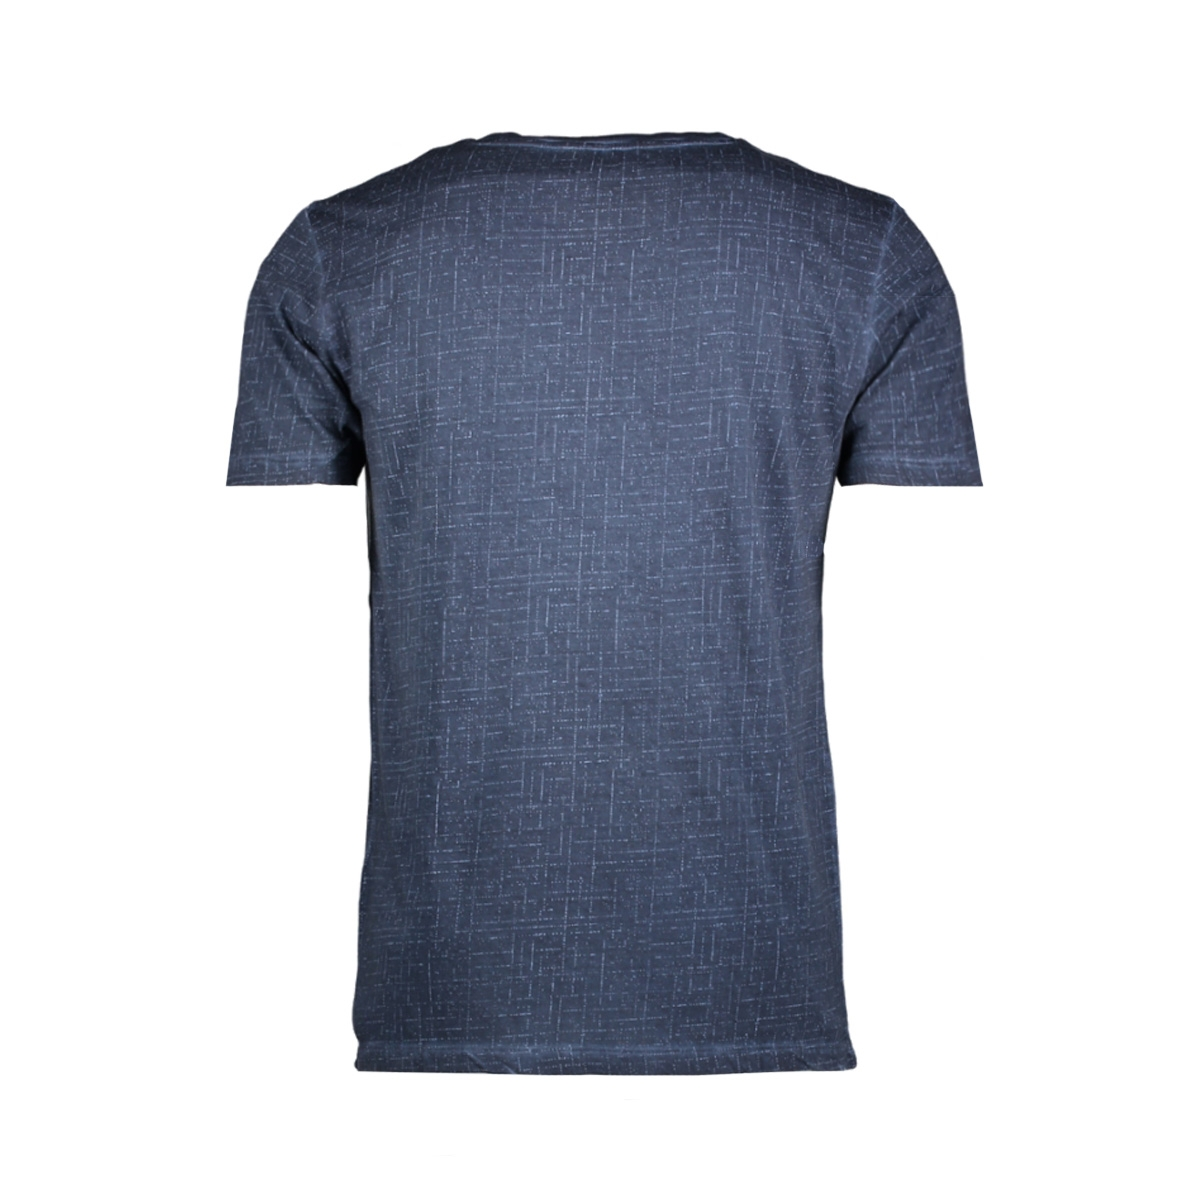 1055177.00.12 tom tailor t-shirt 6576